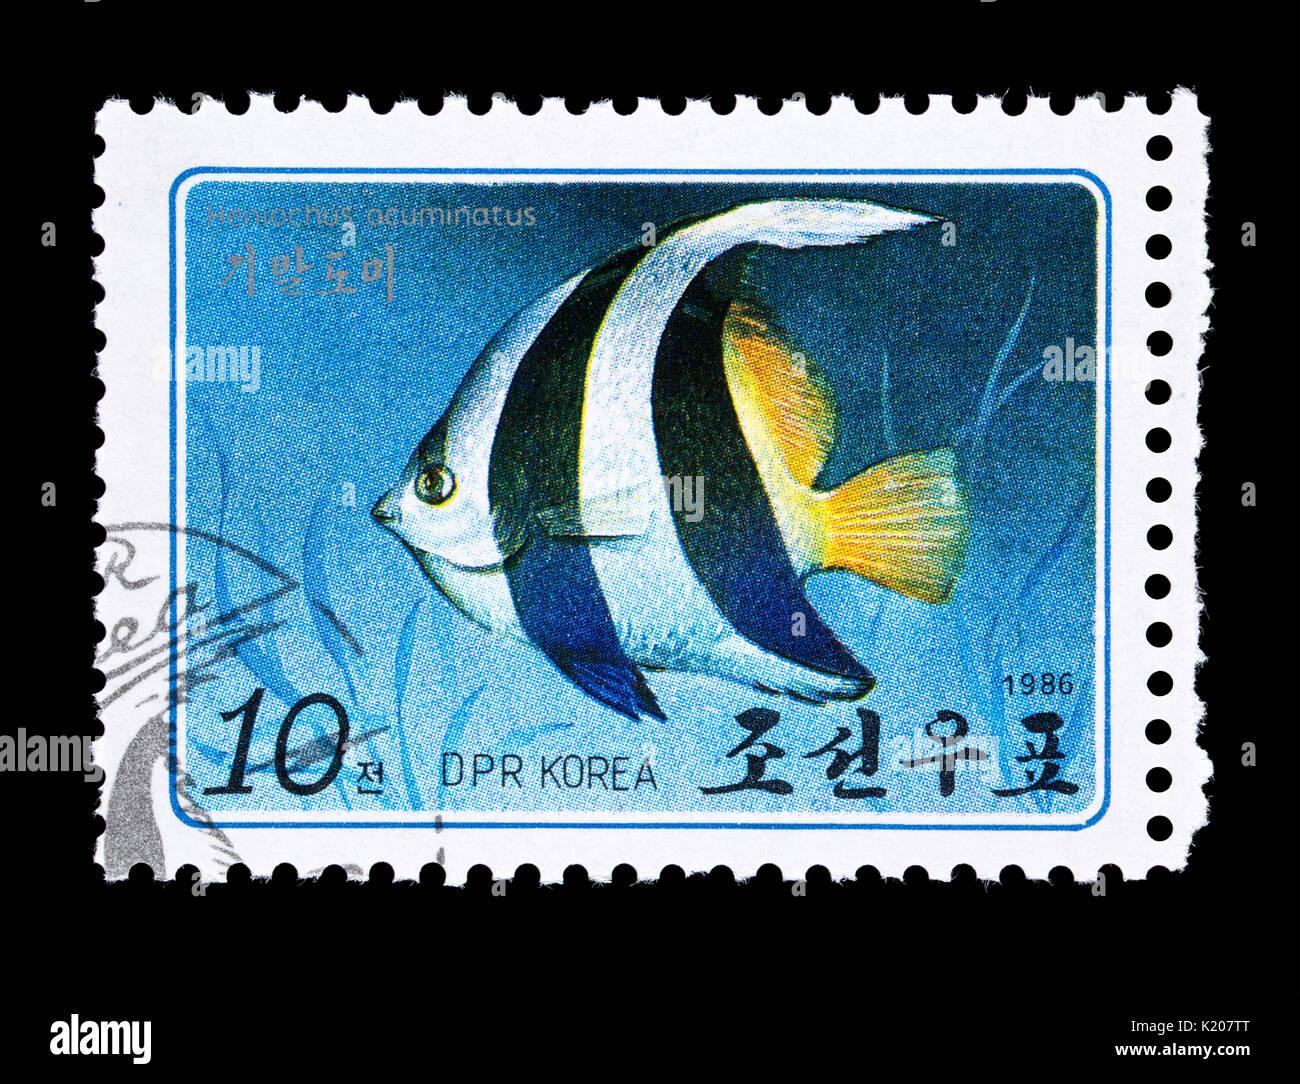 Postage stamp from Nrth Korea depicting a  pennant coralfish (Heniochus acuminatus) - Stock Image